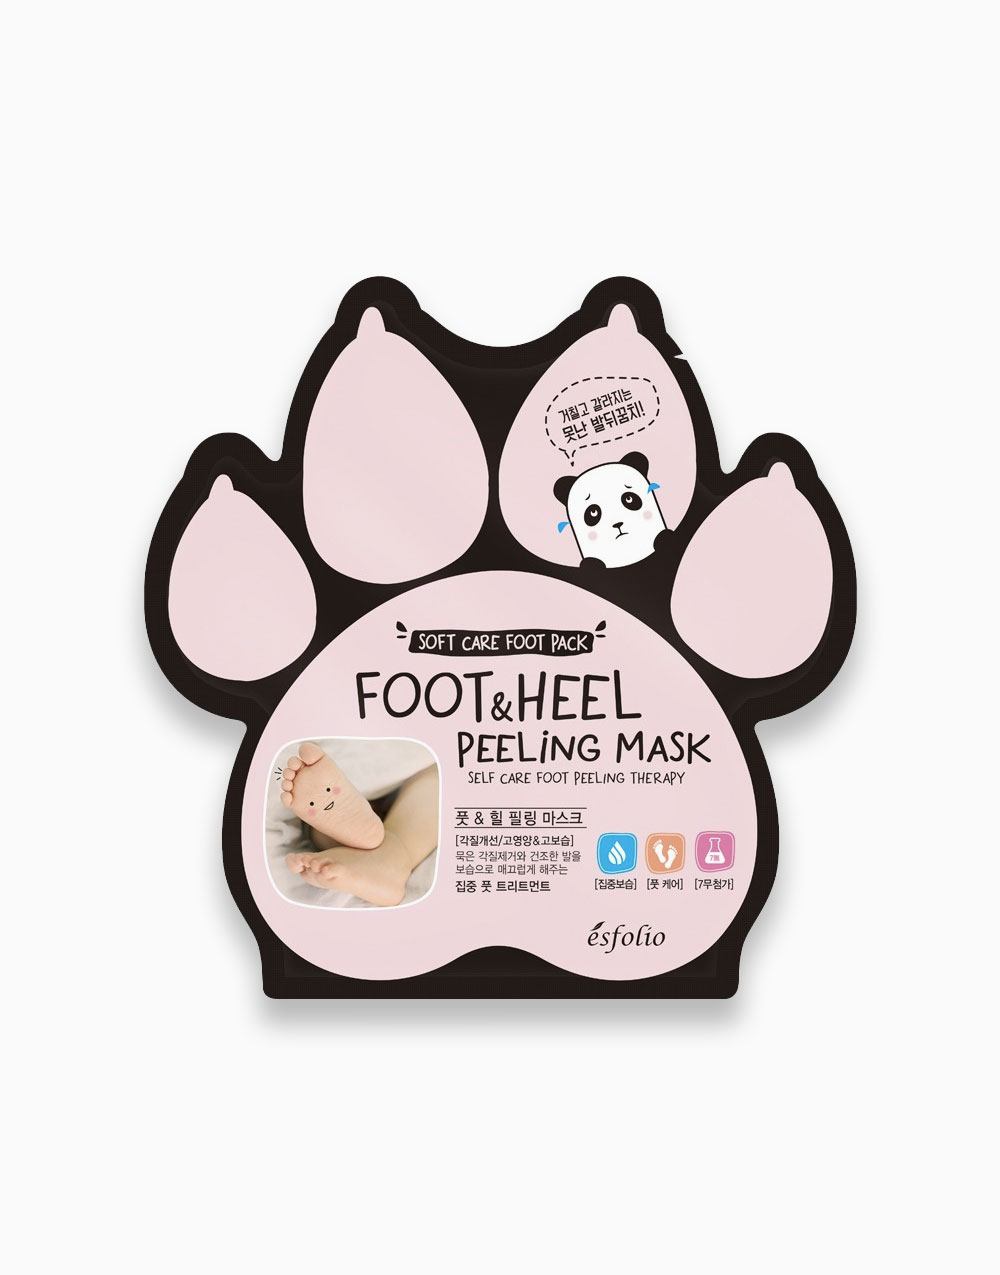 Foot & Heel Peeling Mask by Esfolio